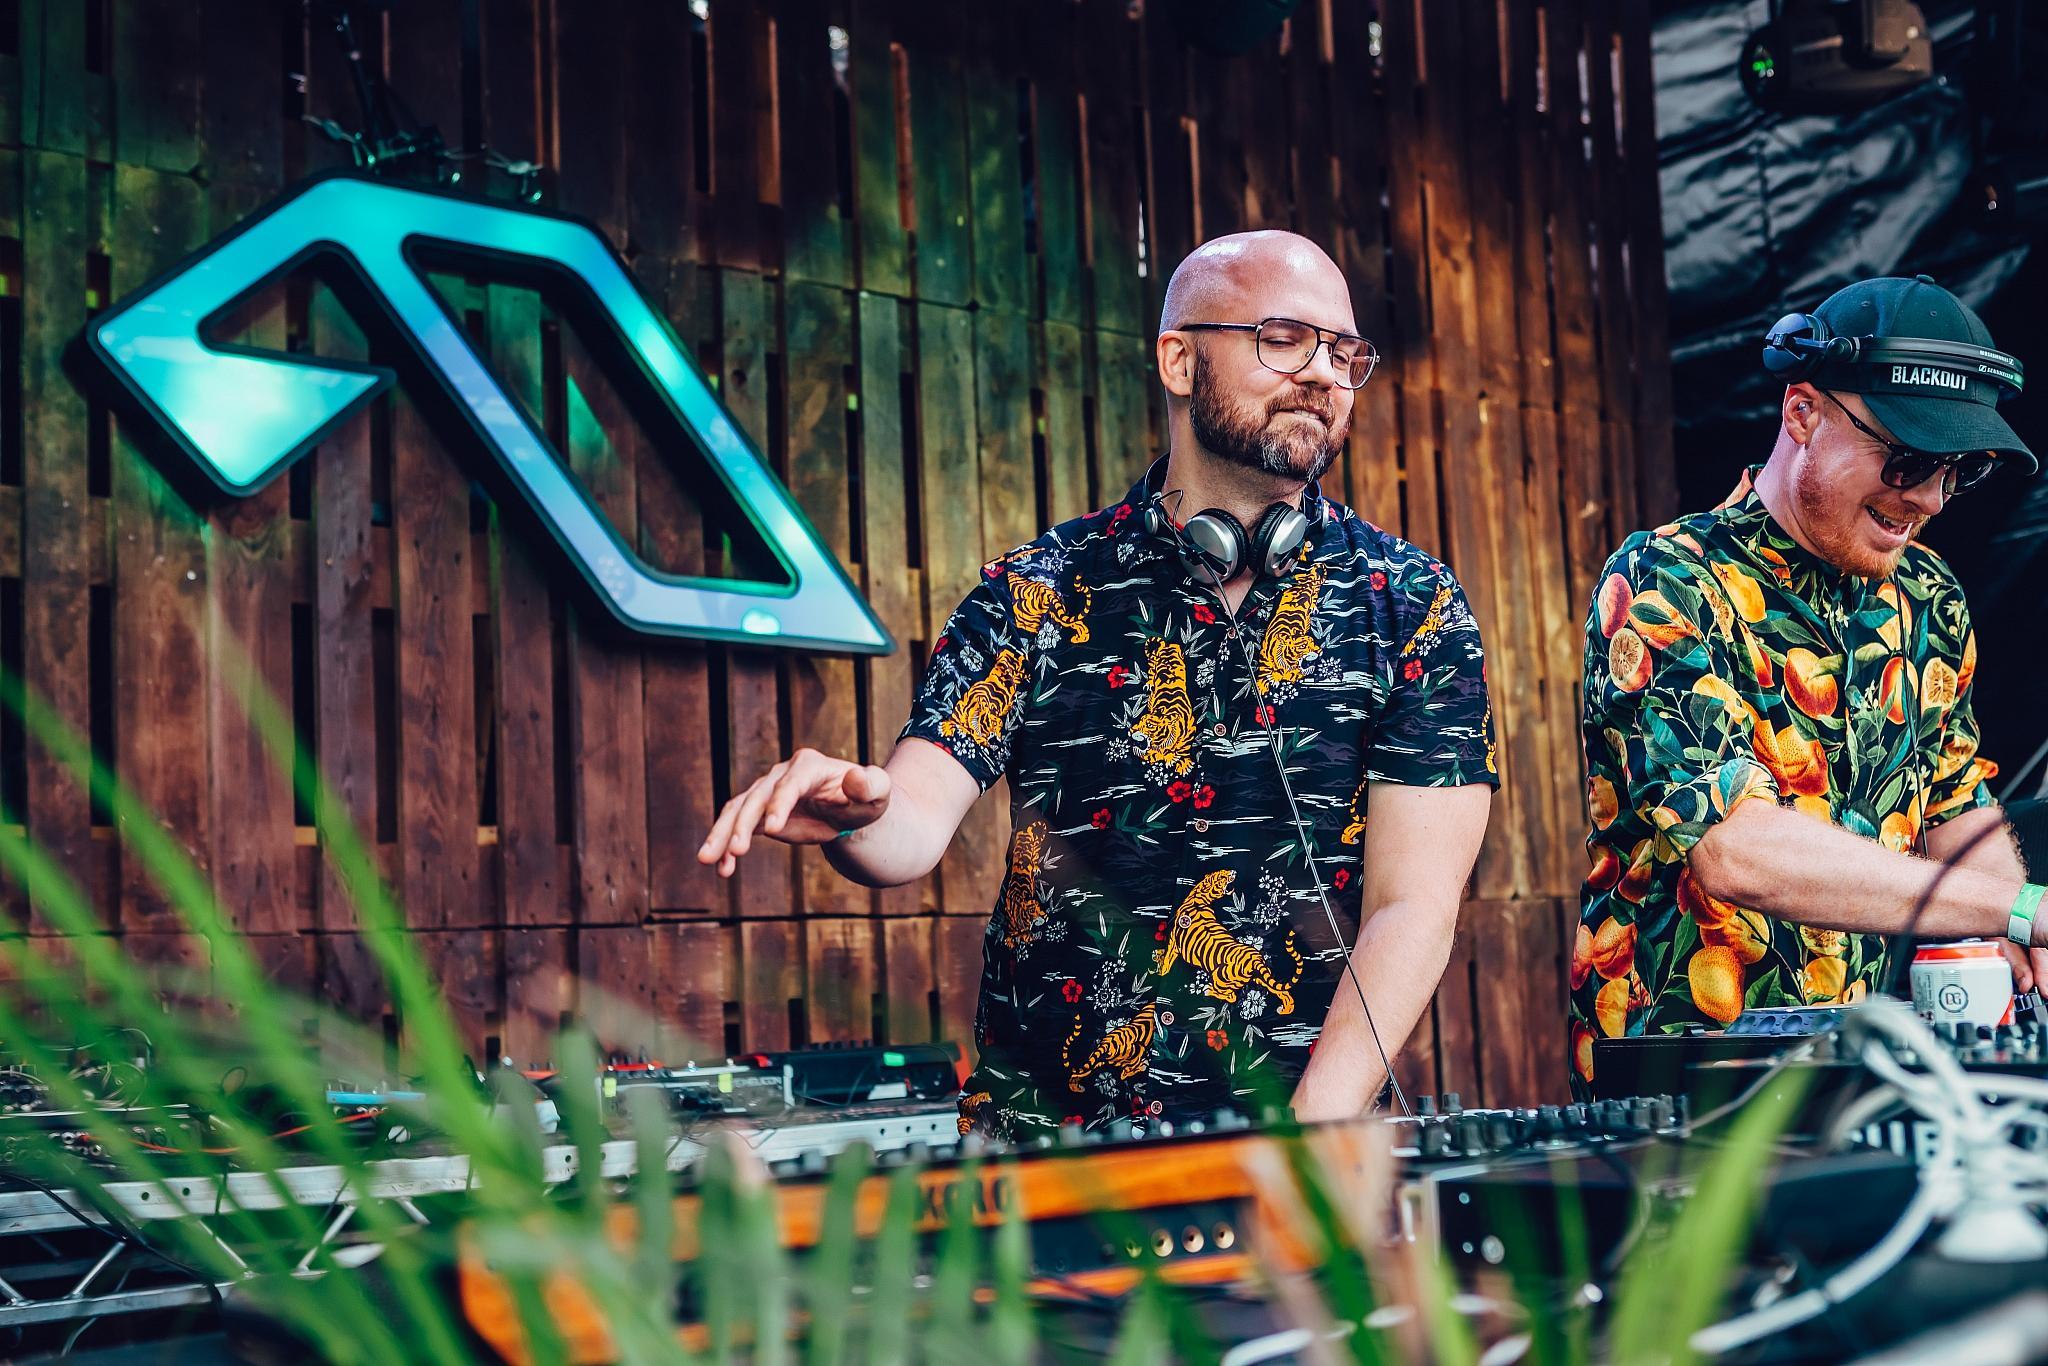 anjundeep uk festival DJ